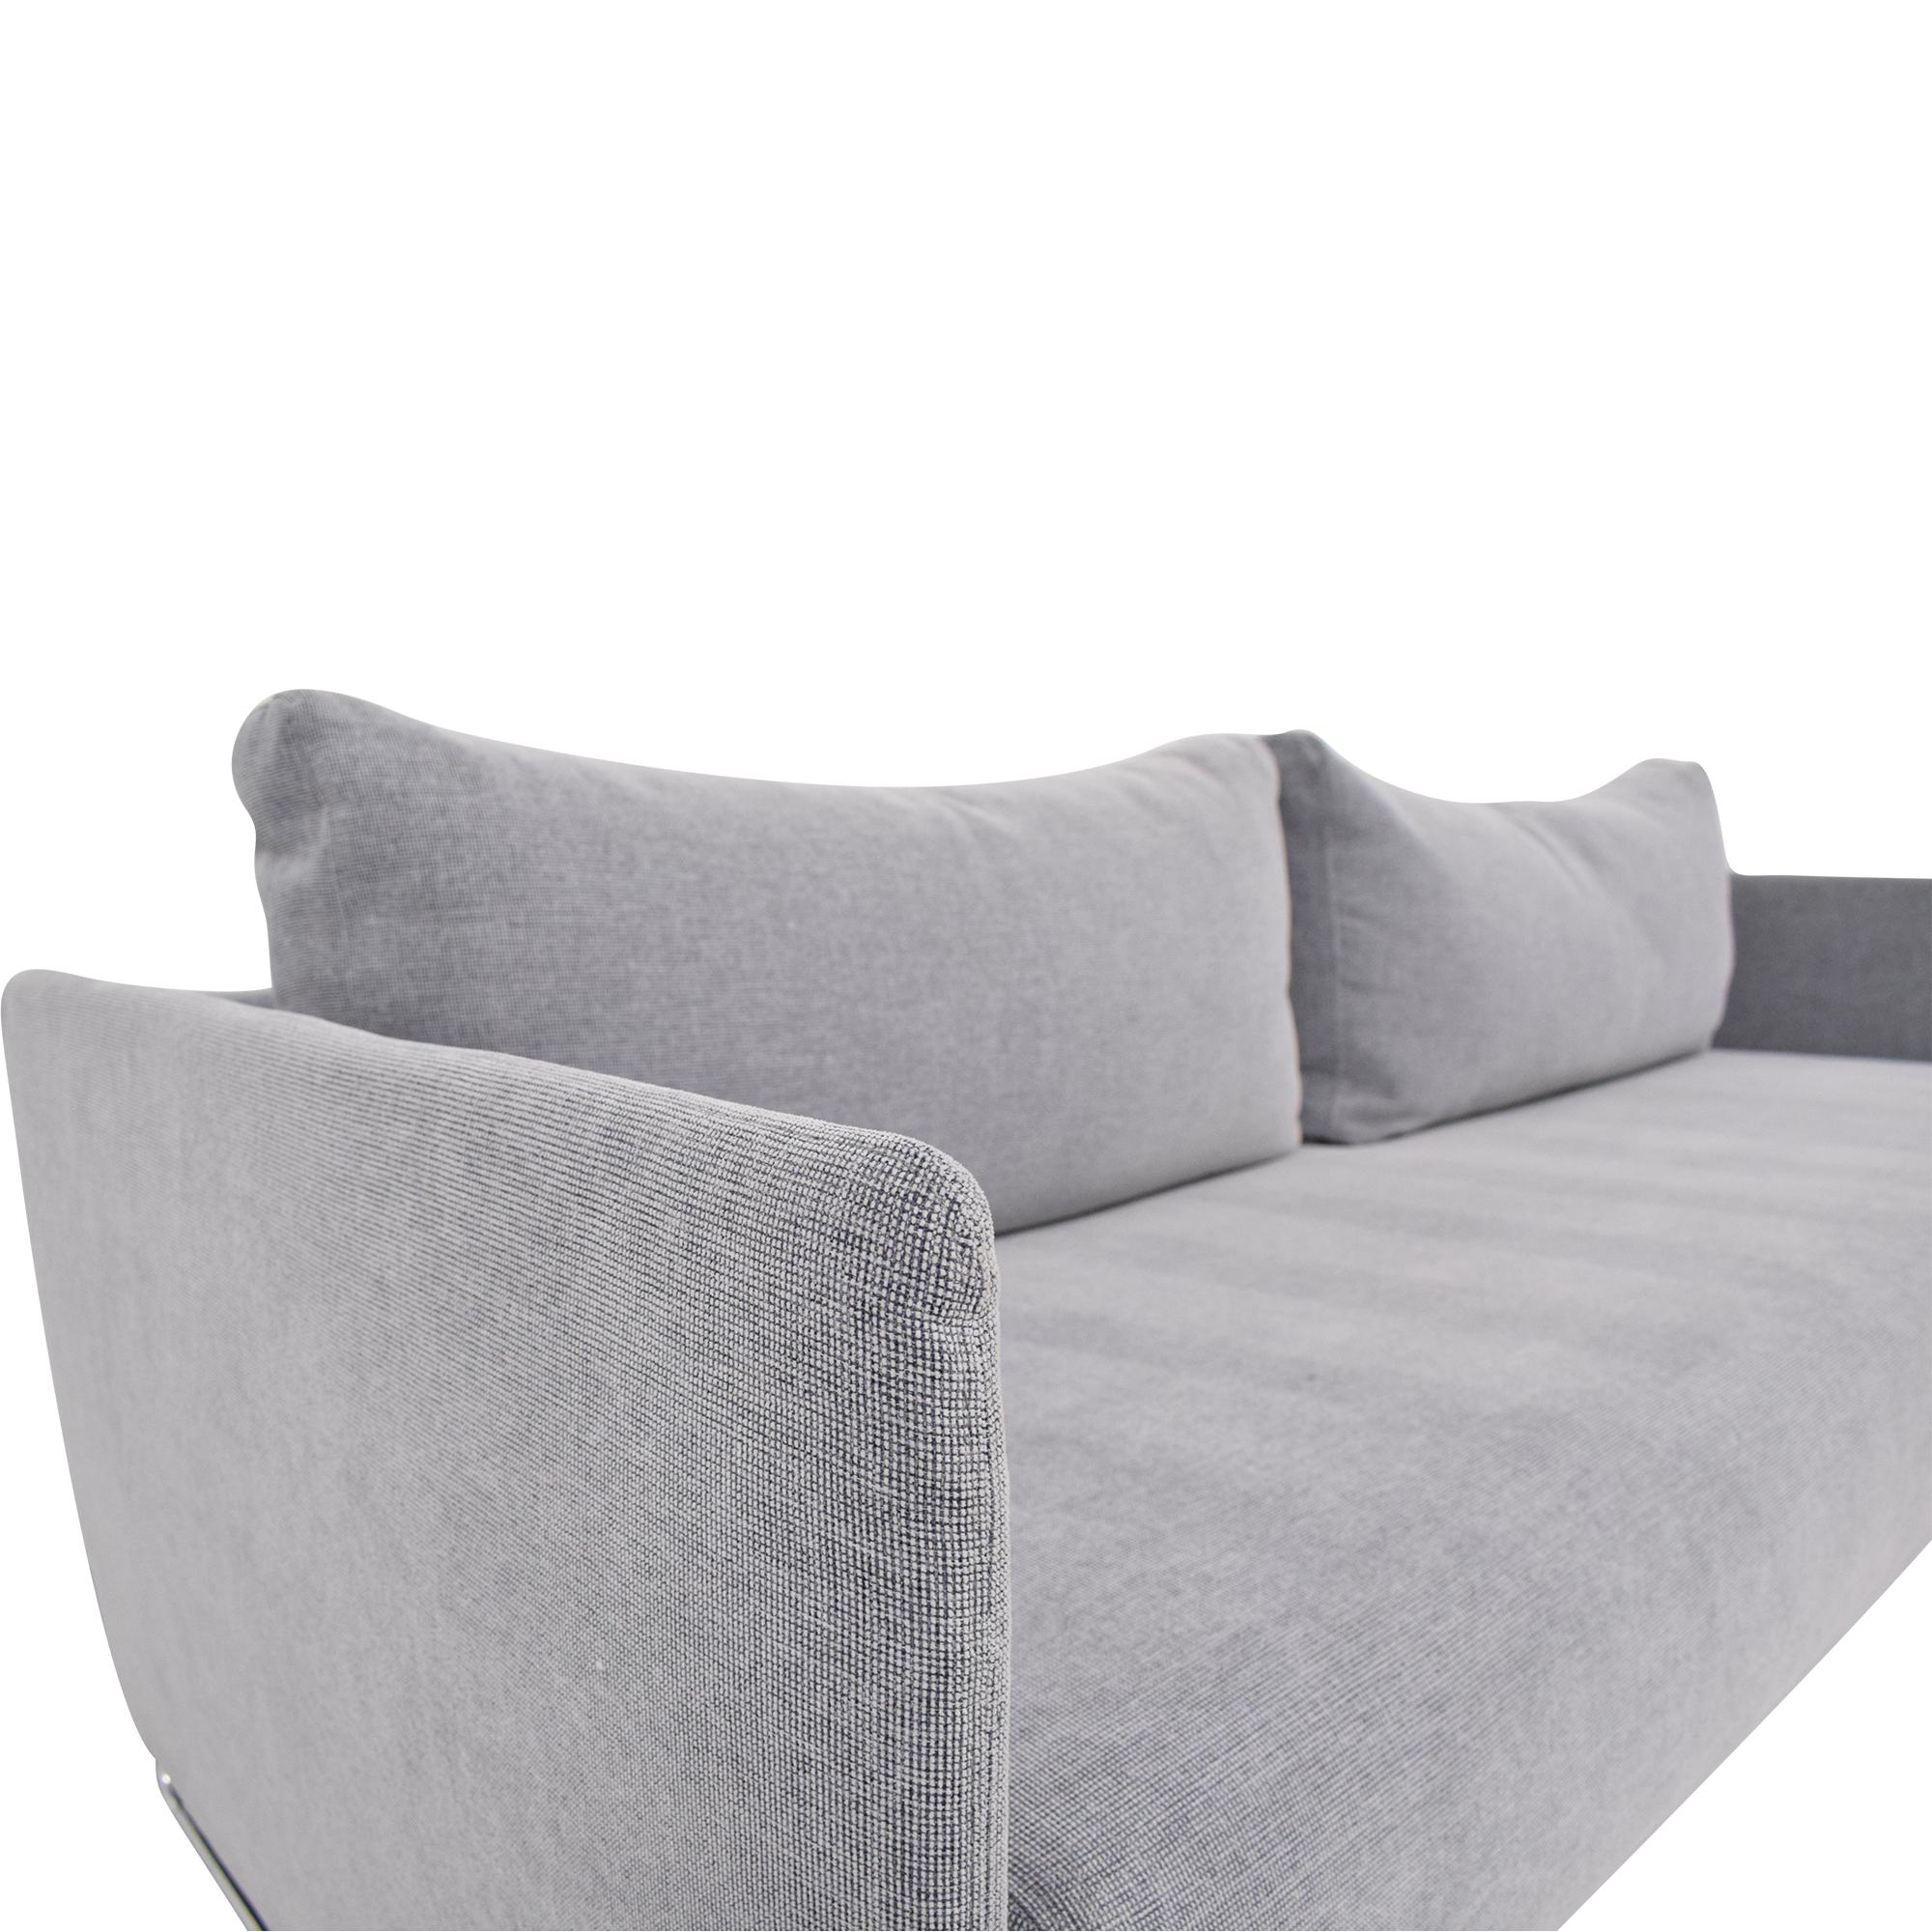 CB2 CB2 Tandom Microgrid Sleeper Sofa dimensions